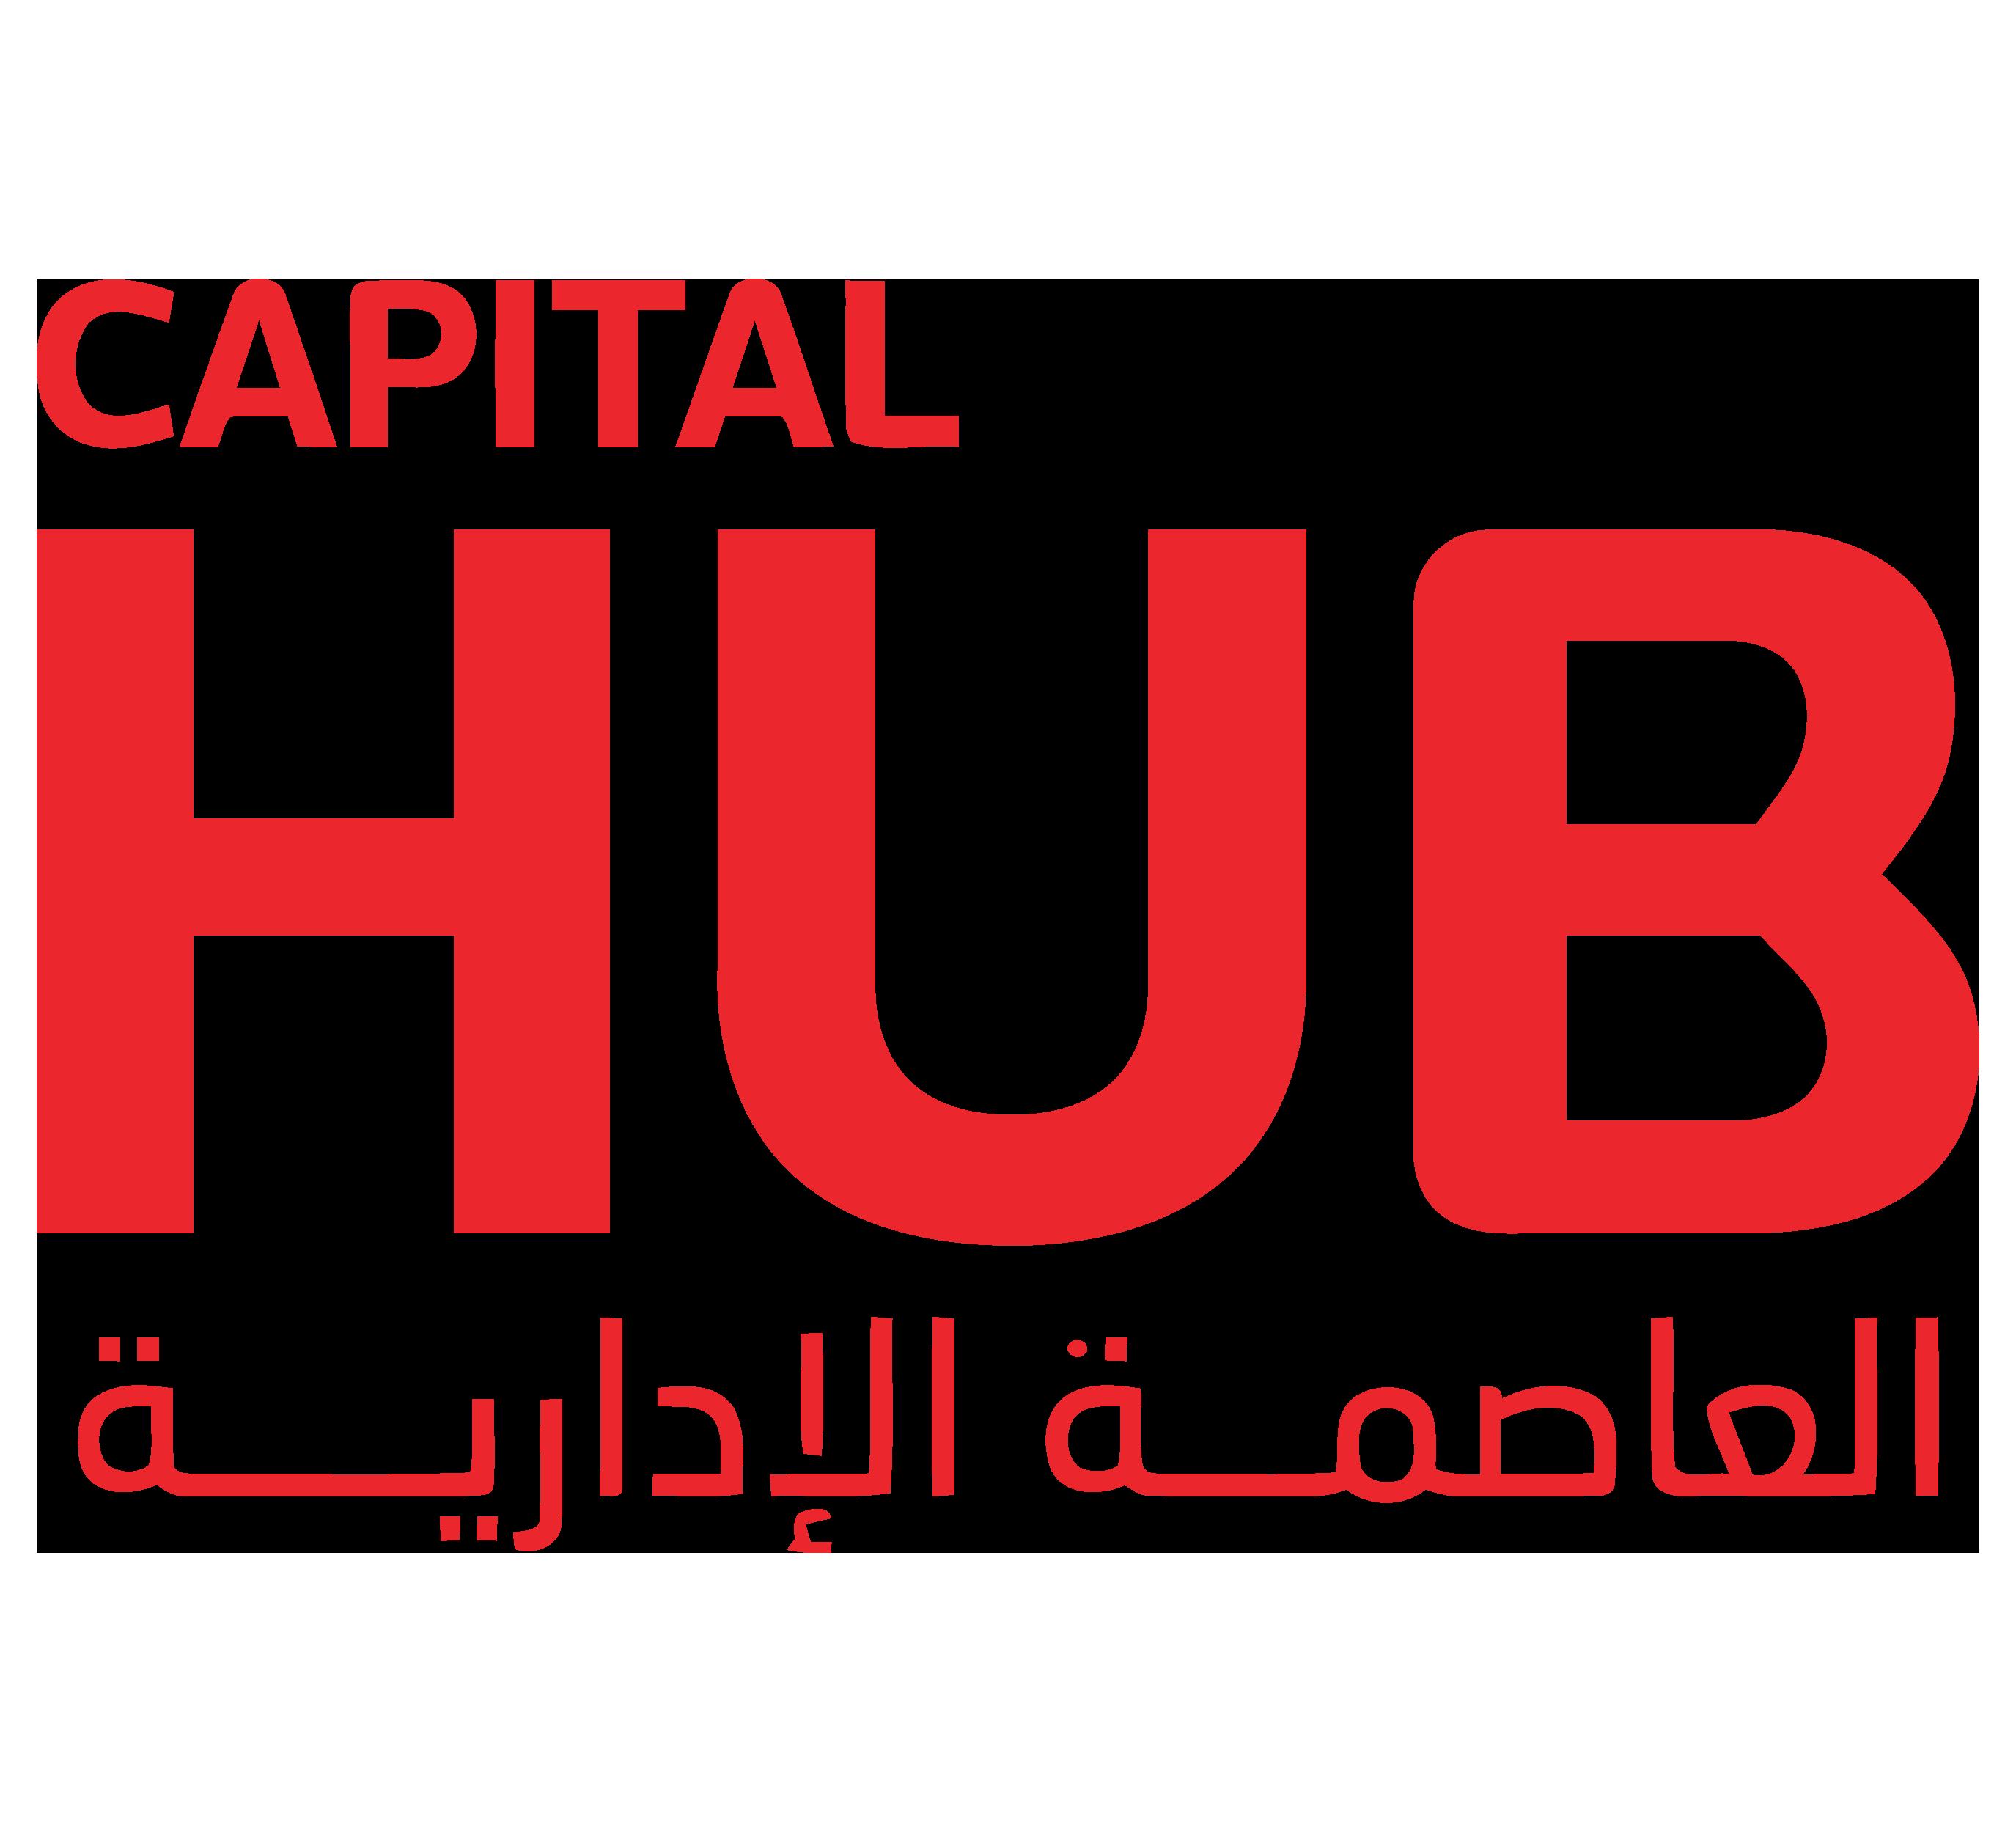 CAPITAL-HUB